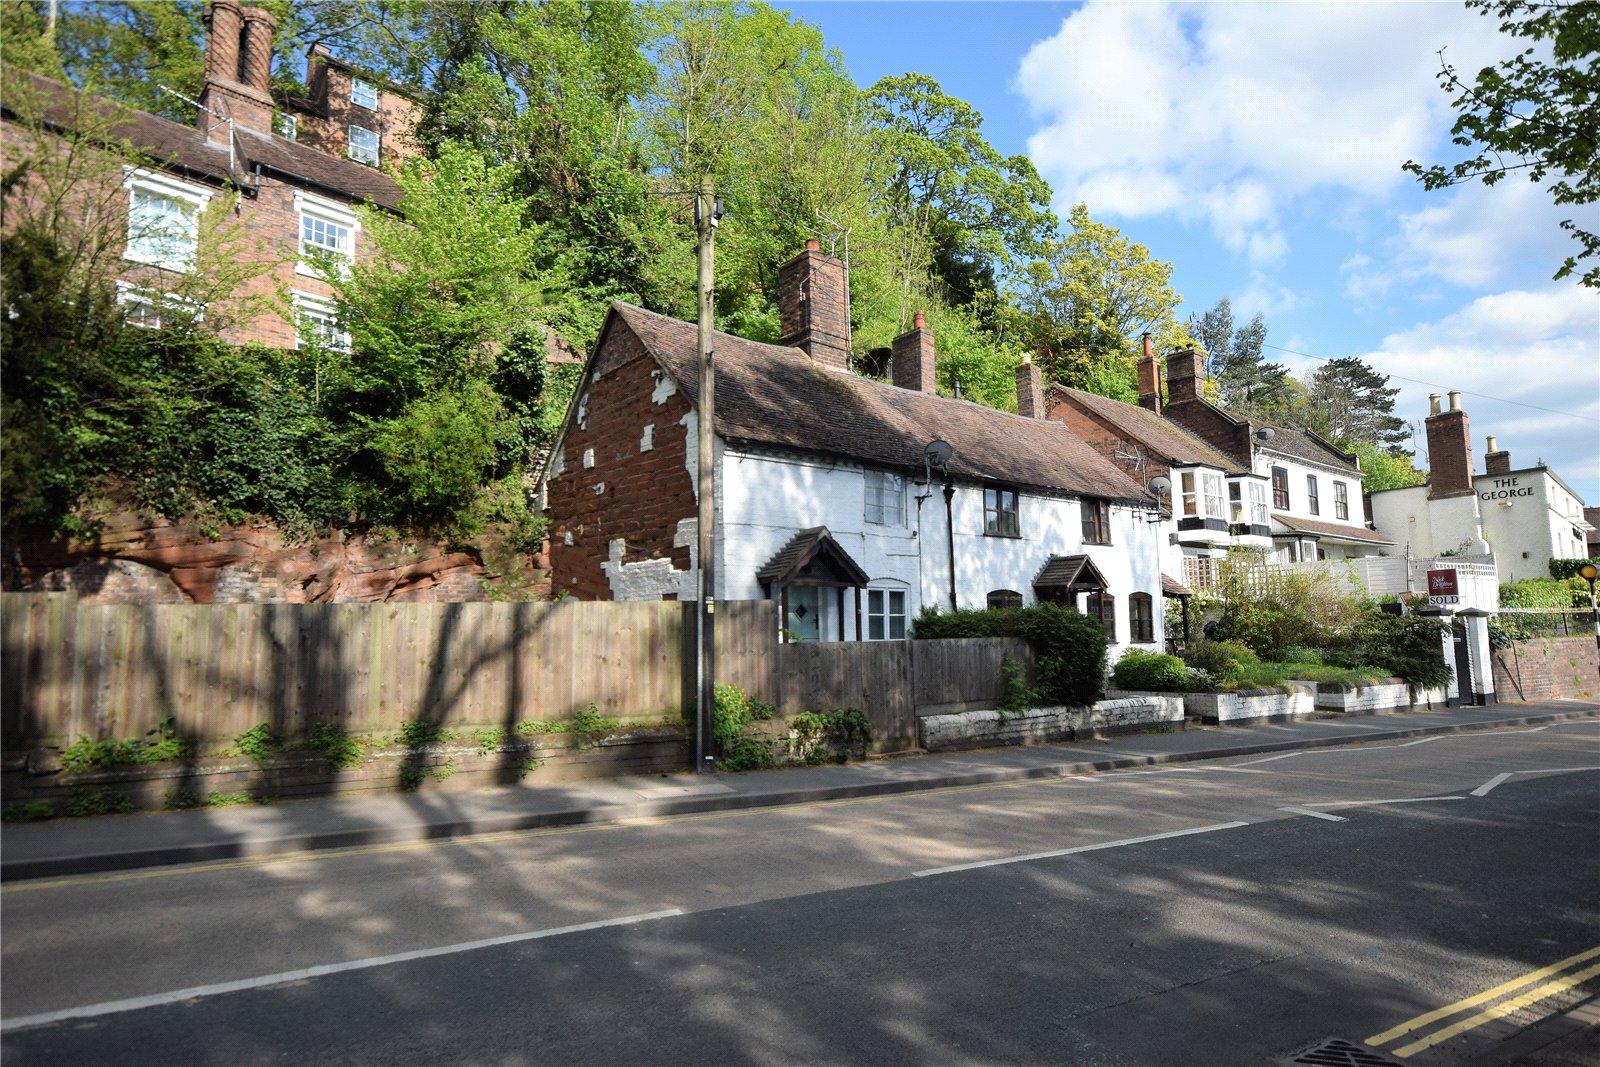 16 Hollybush Road, Shropshire, WV16